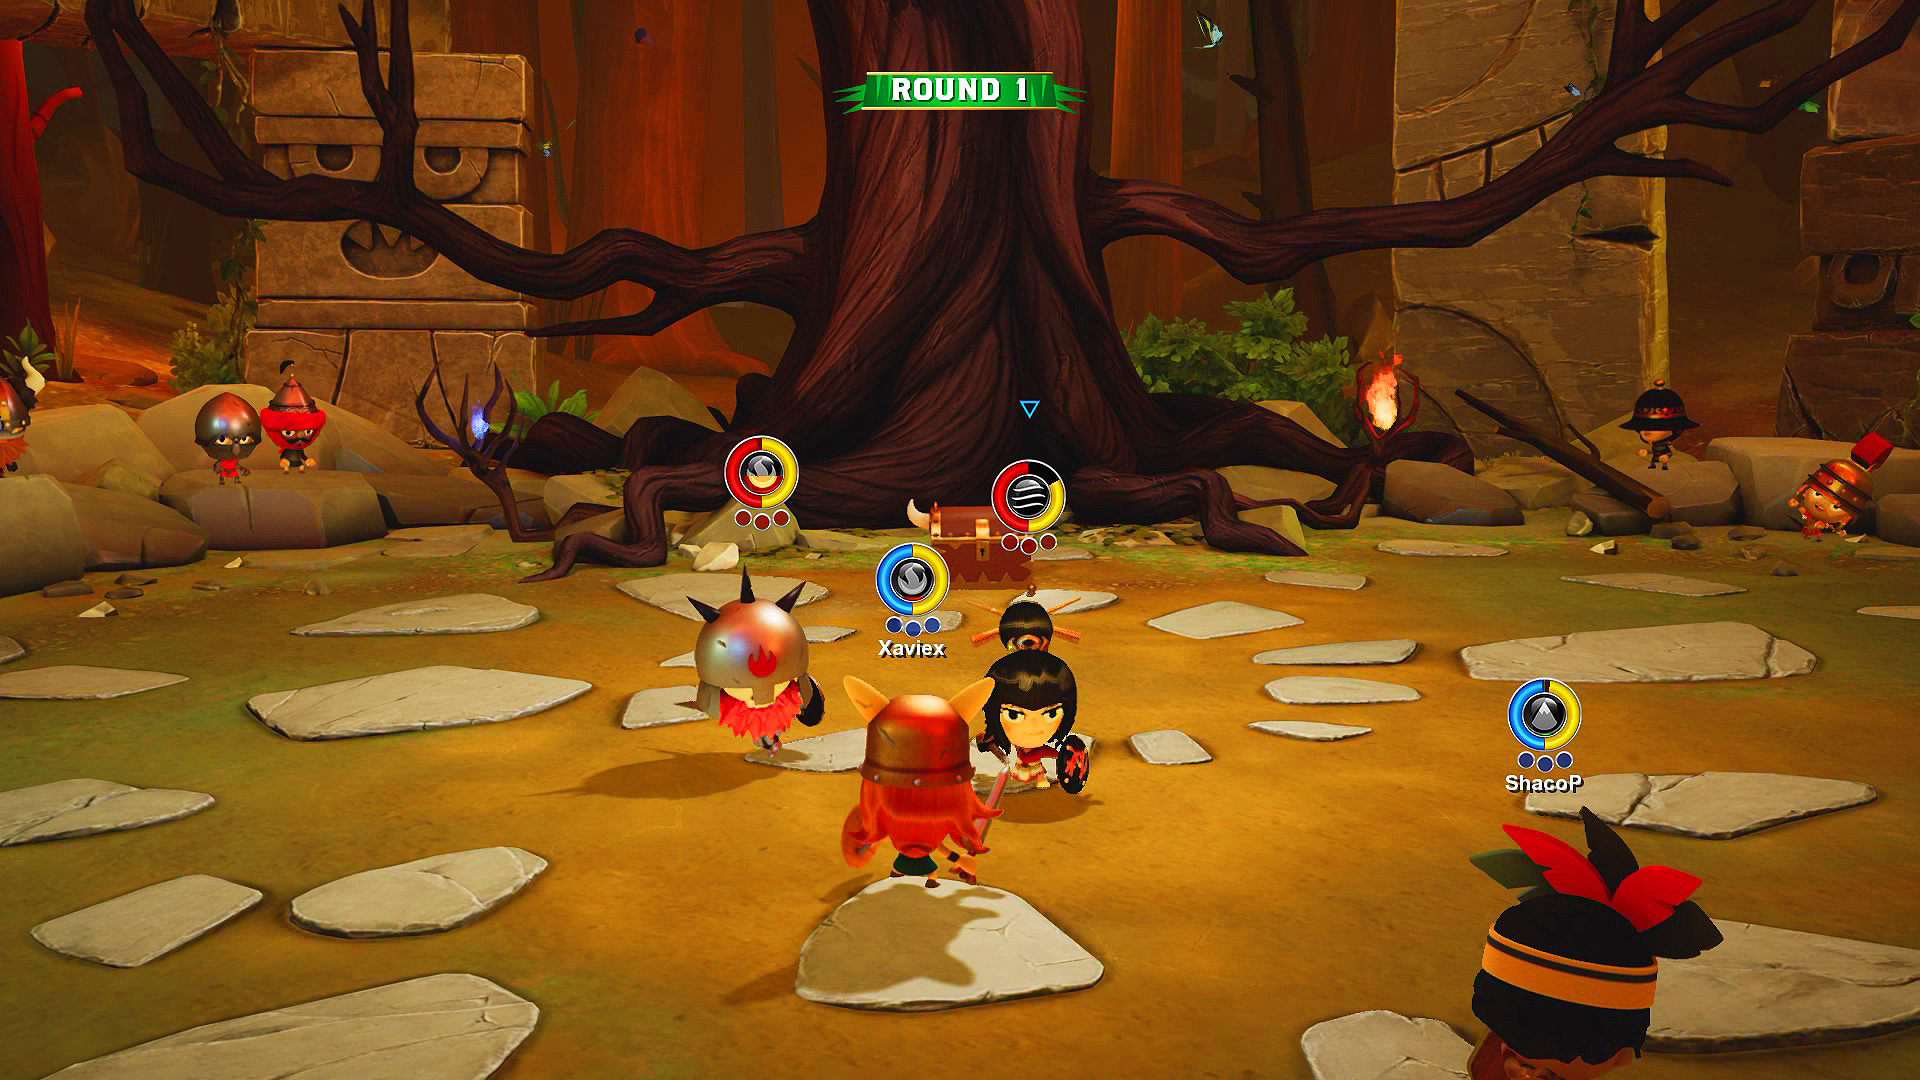 world-of-warriors-screen-01-ps4-eu-15feb17